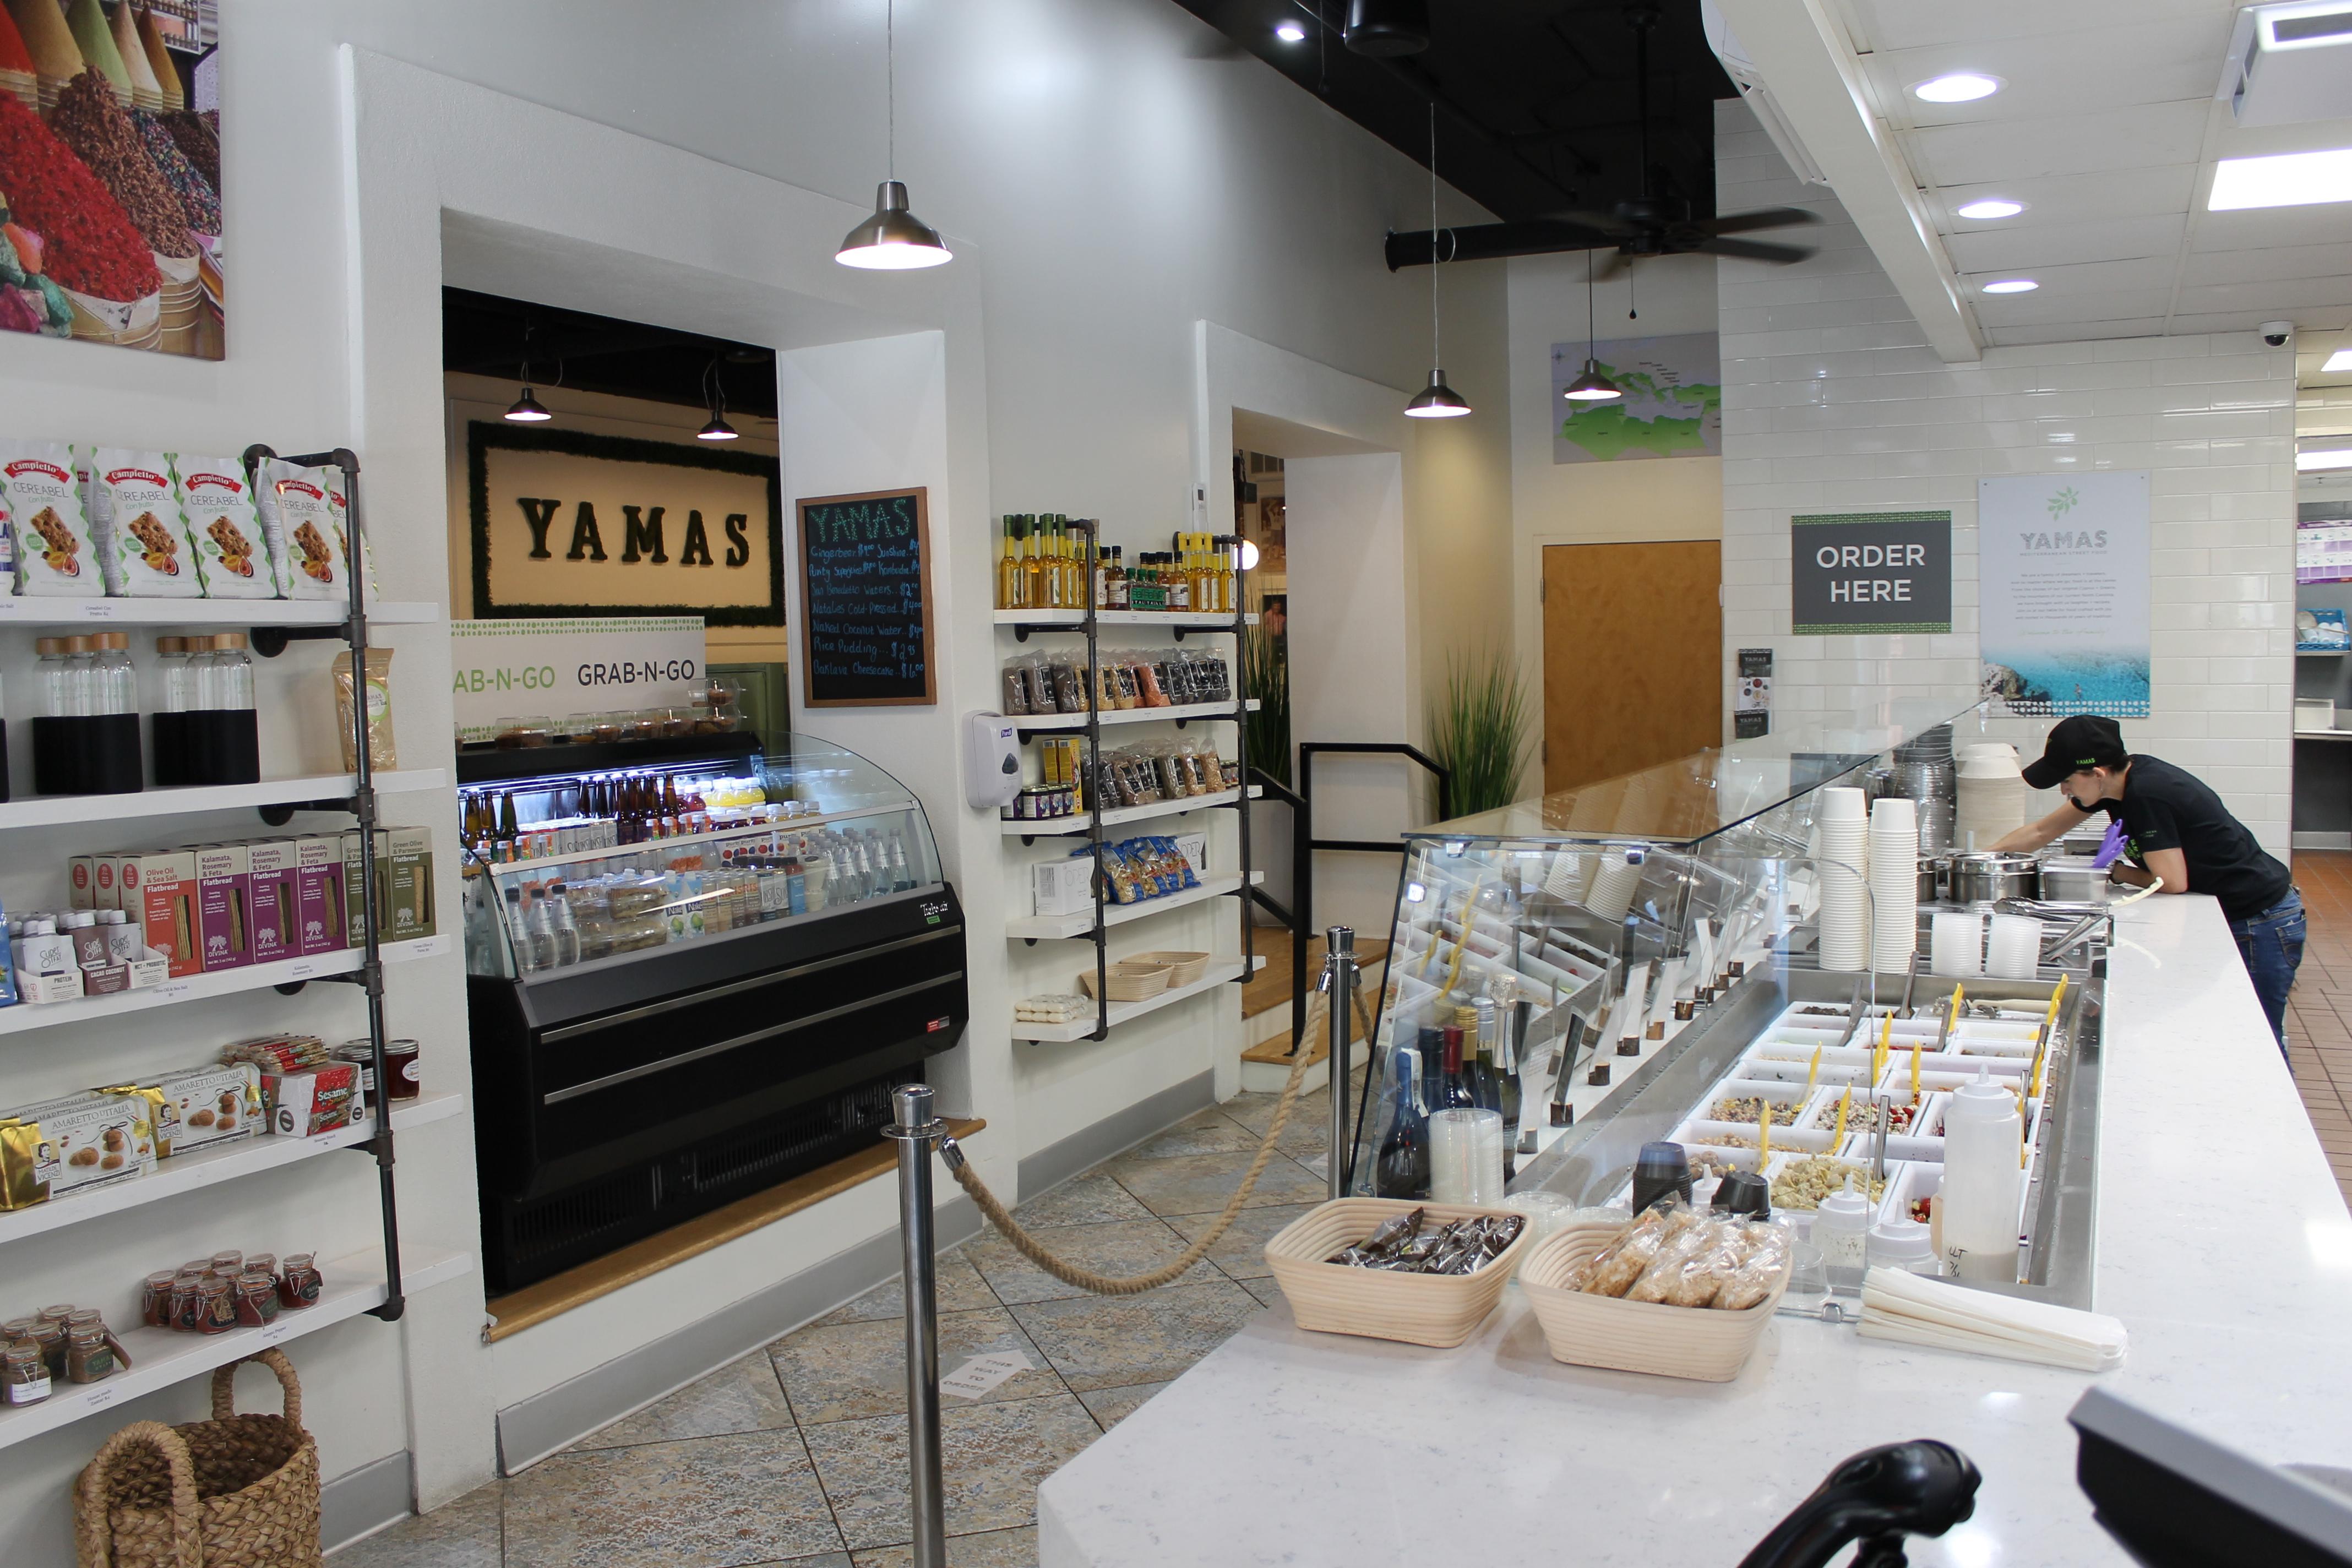 interior view of yamas foo line